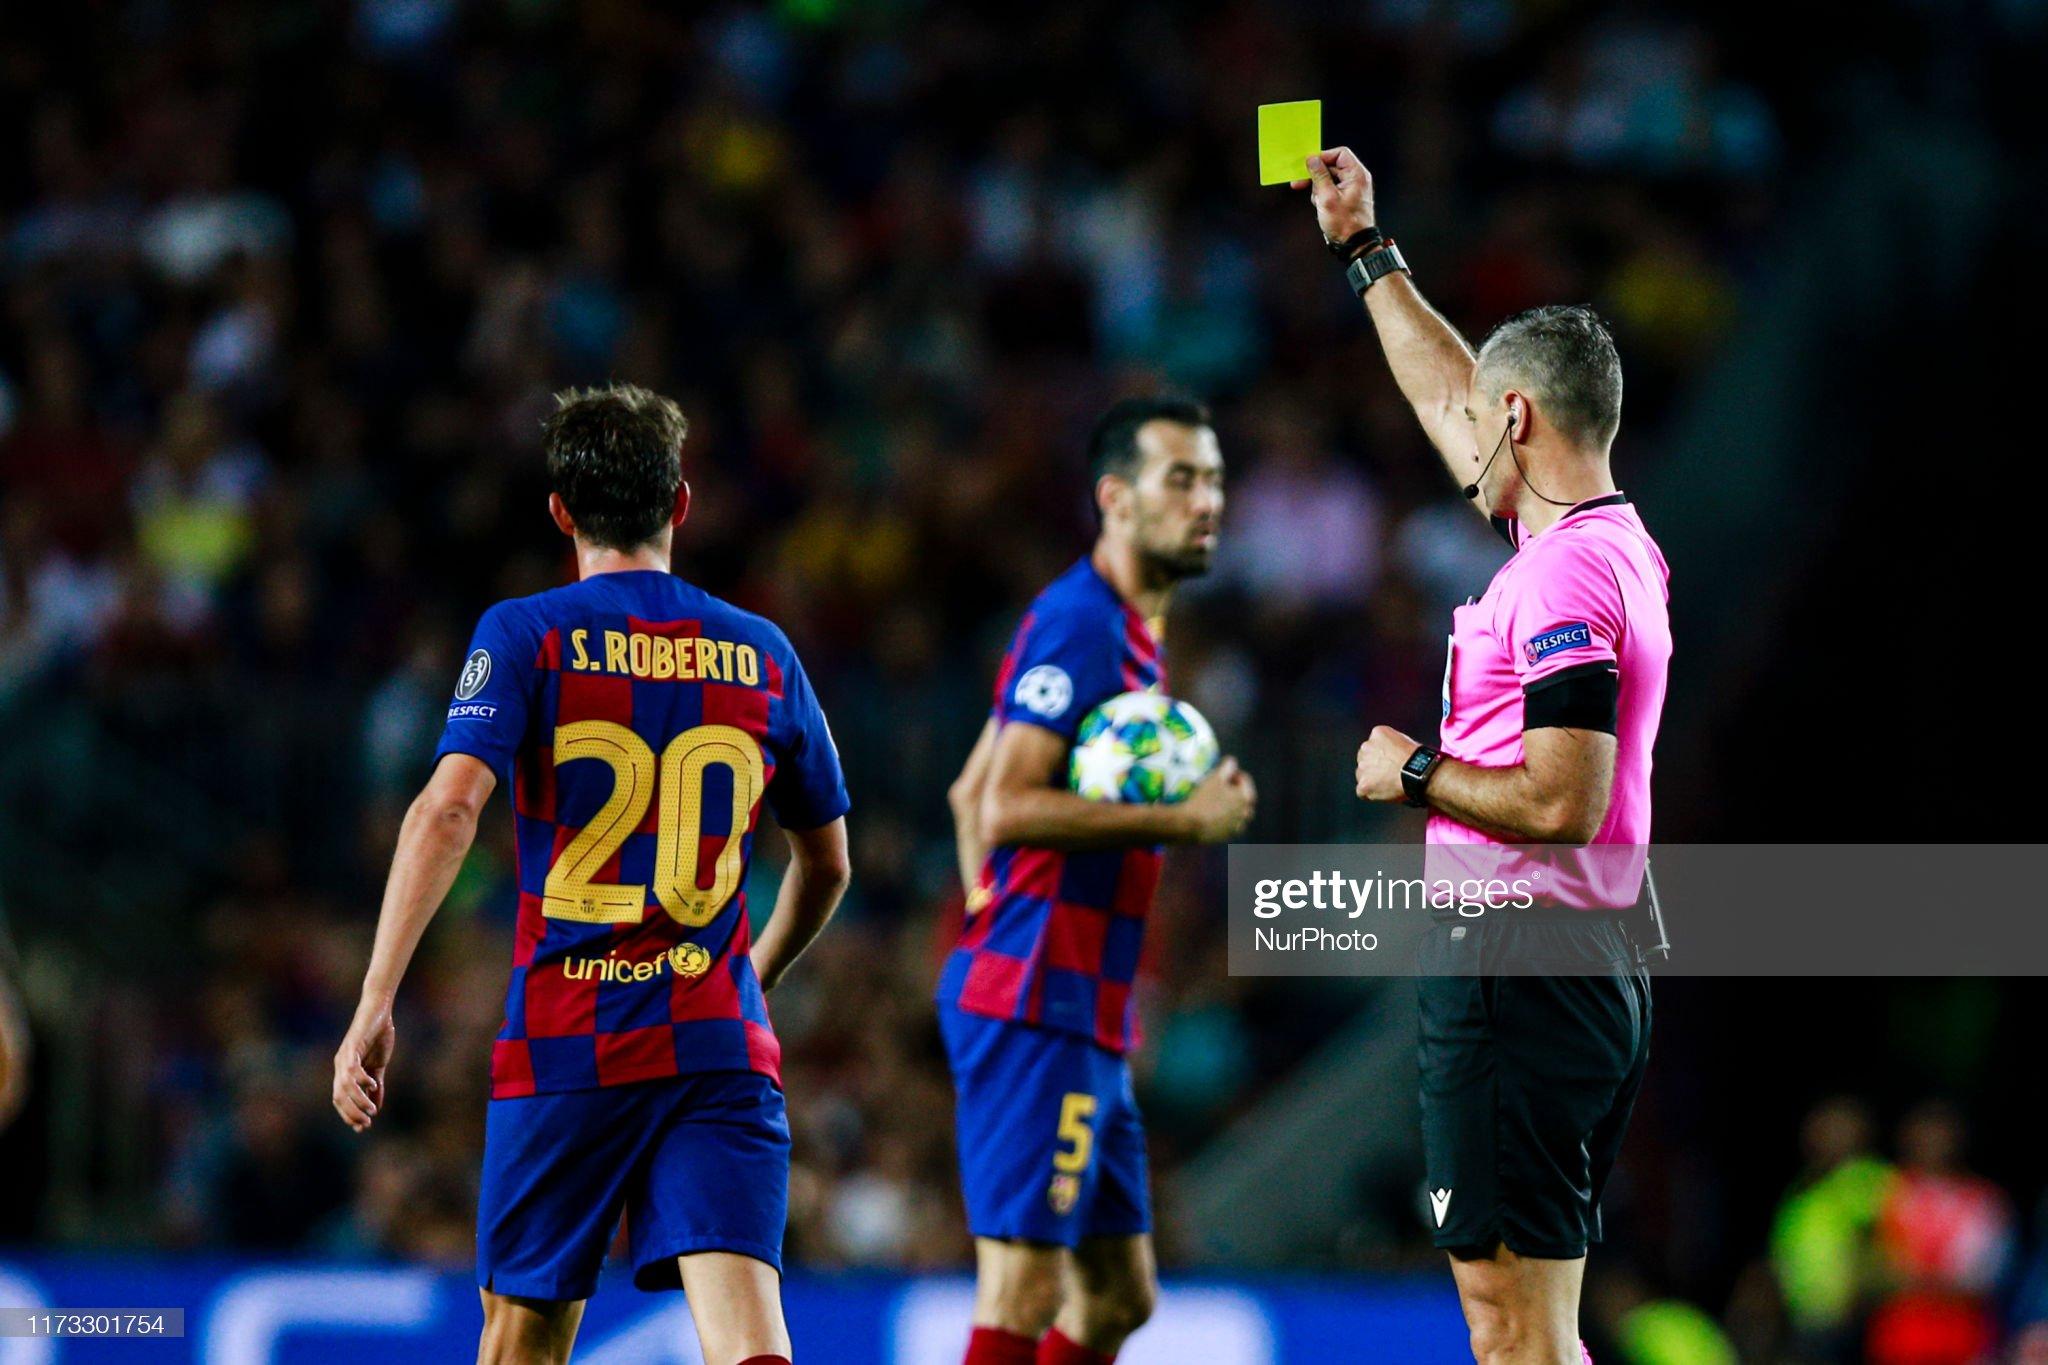 صور مباراة : برشلونة - إنتر 2-1 ( 02-10-2019 )  Yellow-card-for-20-sergi-roberto-from-spain-of-fc-barcelona-during-picture-id1173301754?s=2048x2048